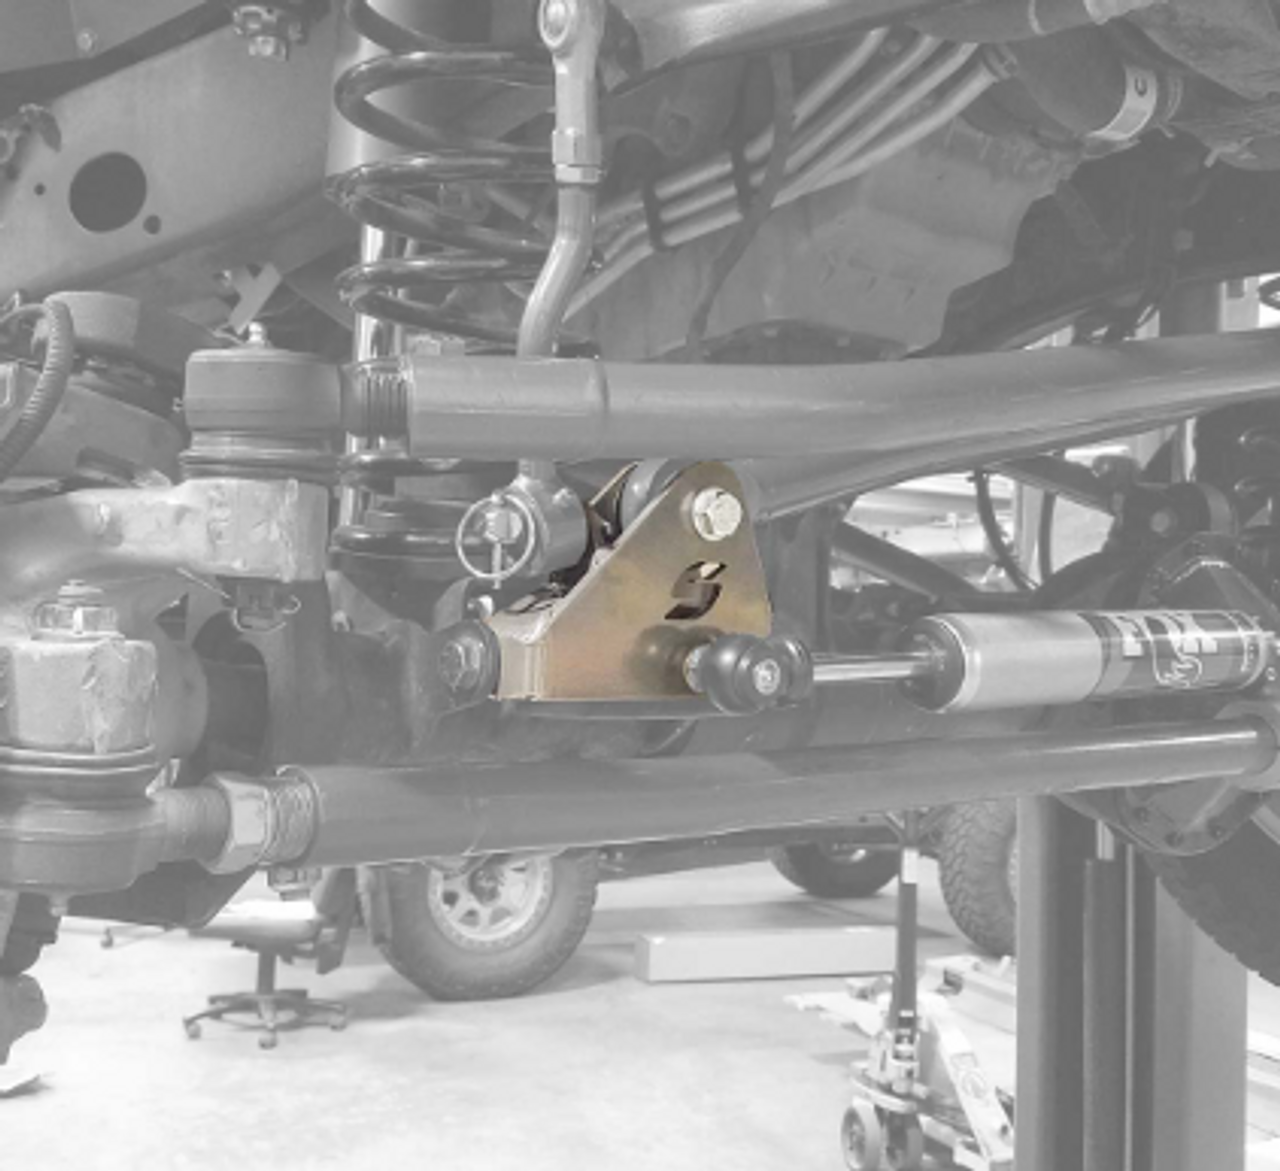 Synergy 8855-01 Front Track Bar Relocation Bracket for Jeep Wrangler JL & Gladiator JT 2018+